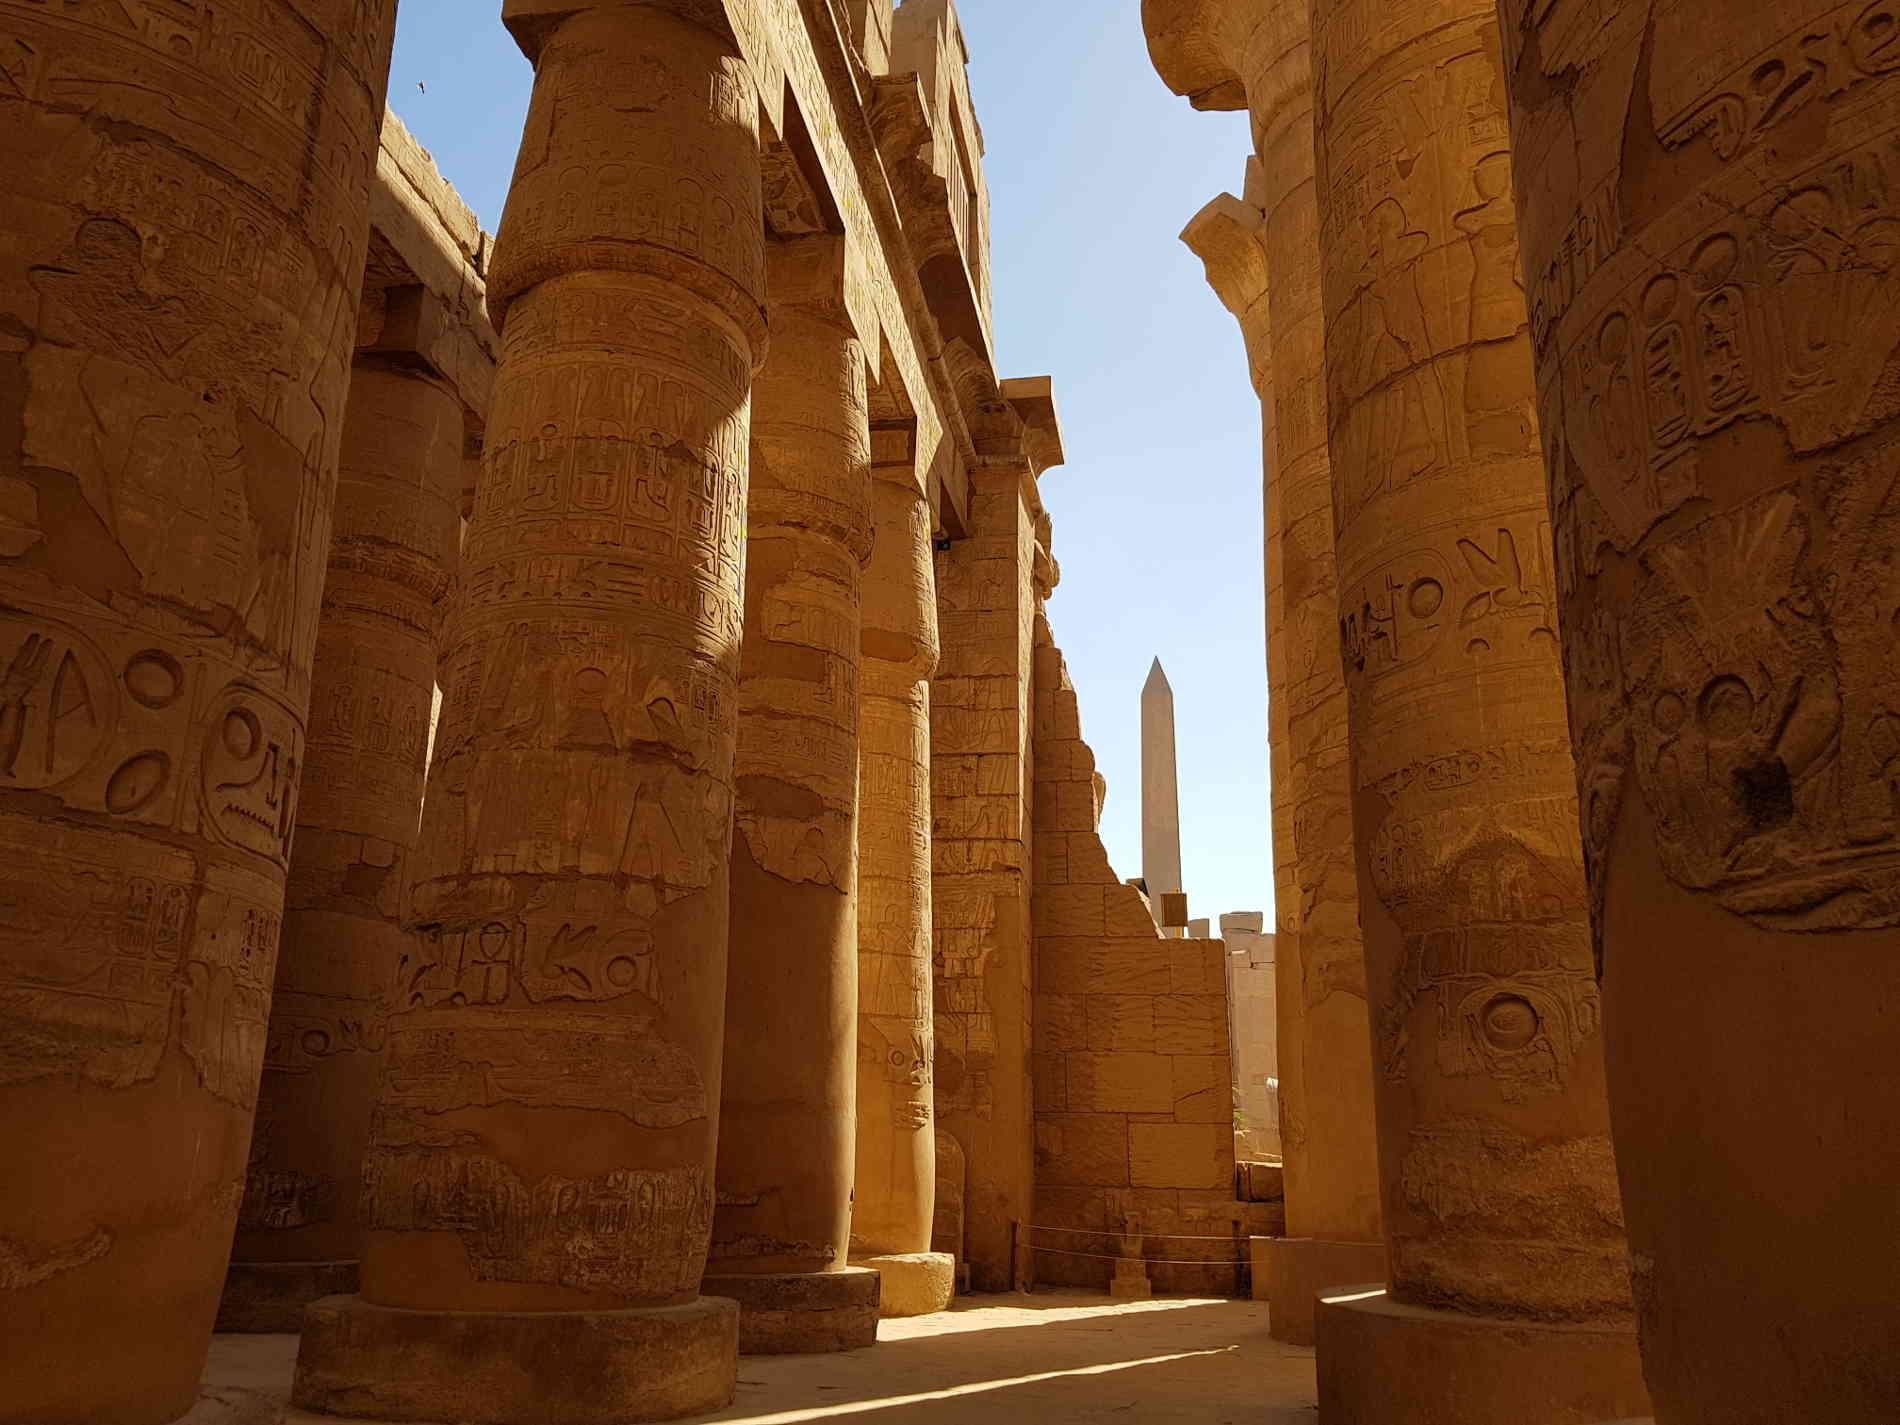 crociera sul Nilo -La Grande Sala Ipostila di Karnak a Luxor